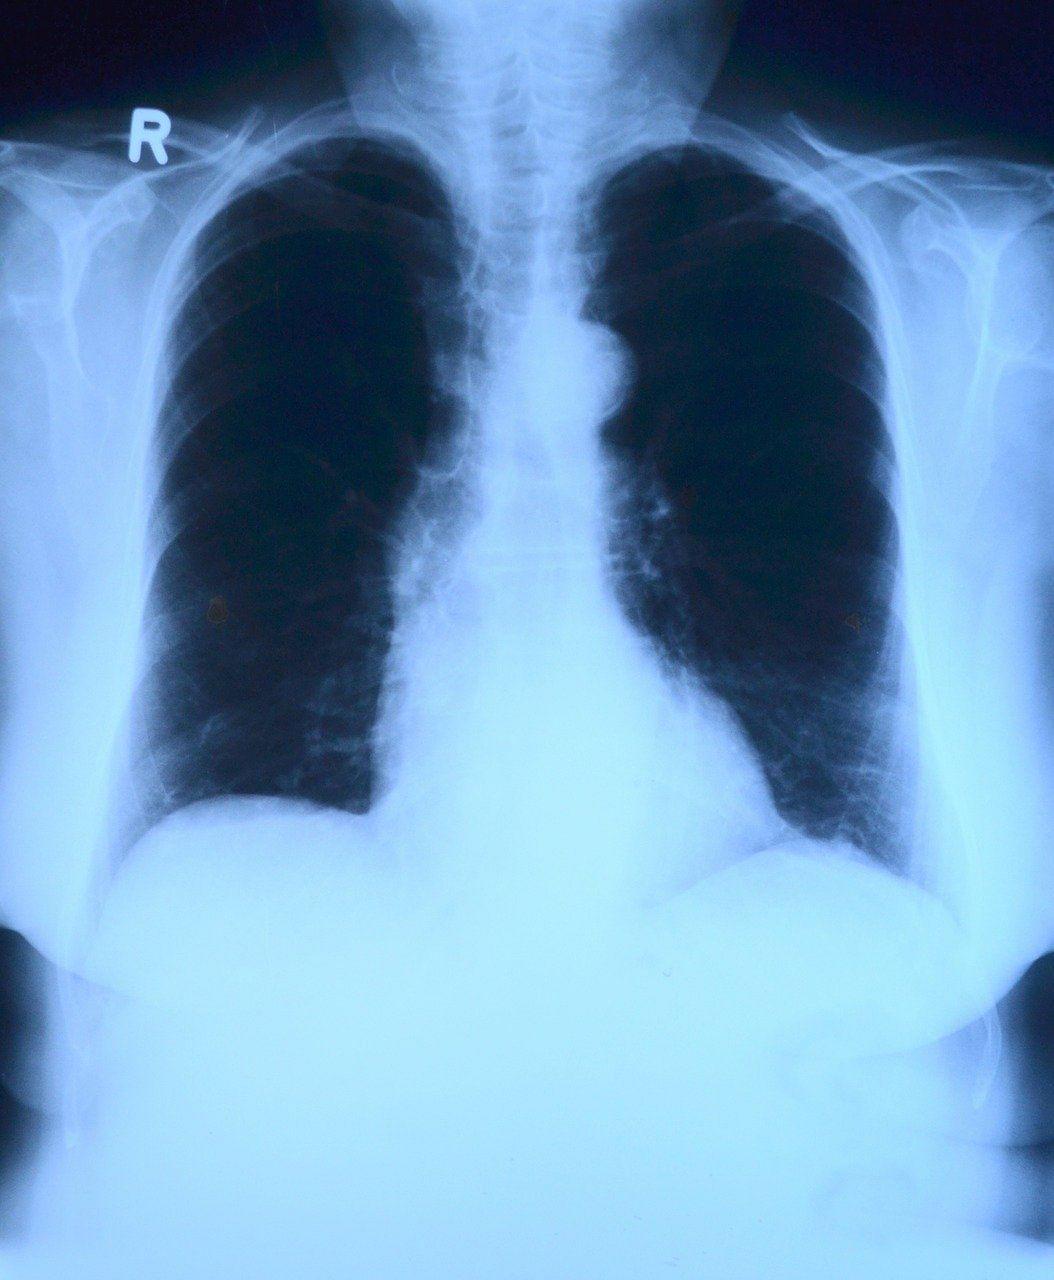 छाती का एक्स-रे टेस्ट - Chest X Ray in Hindi